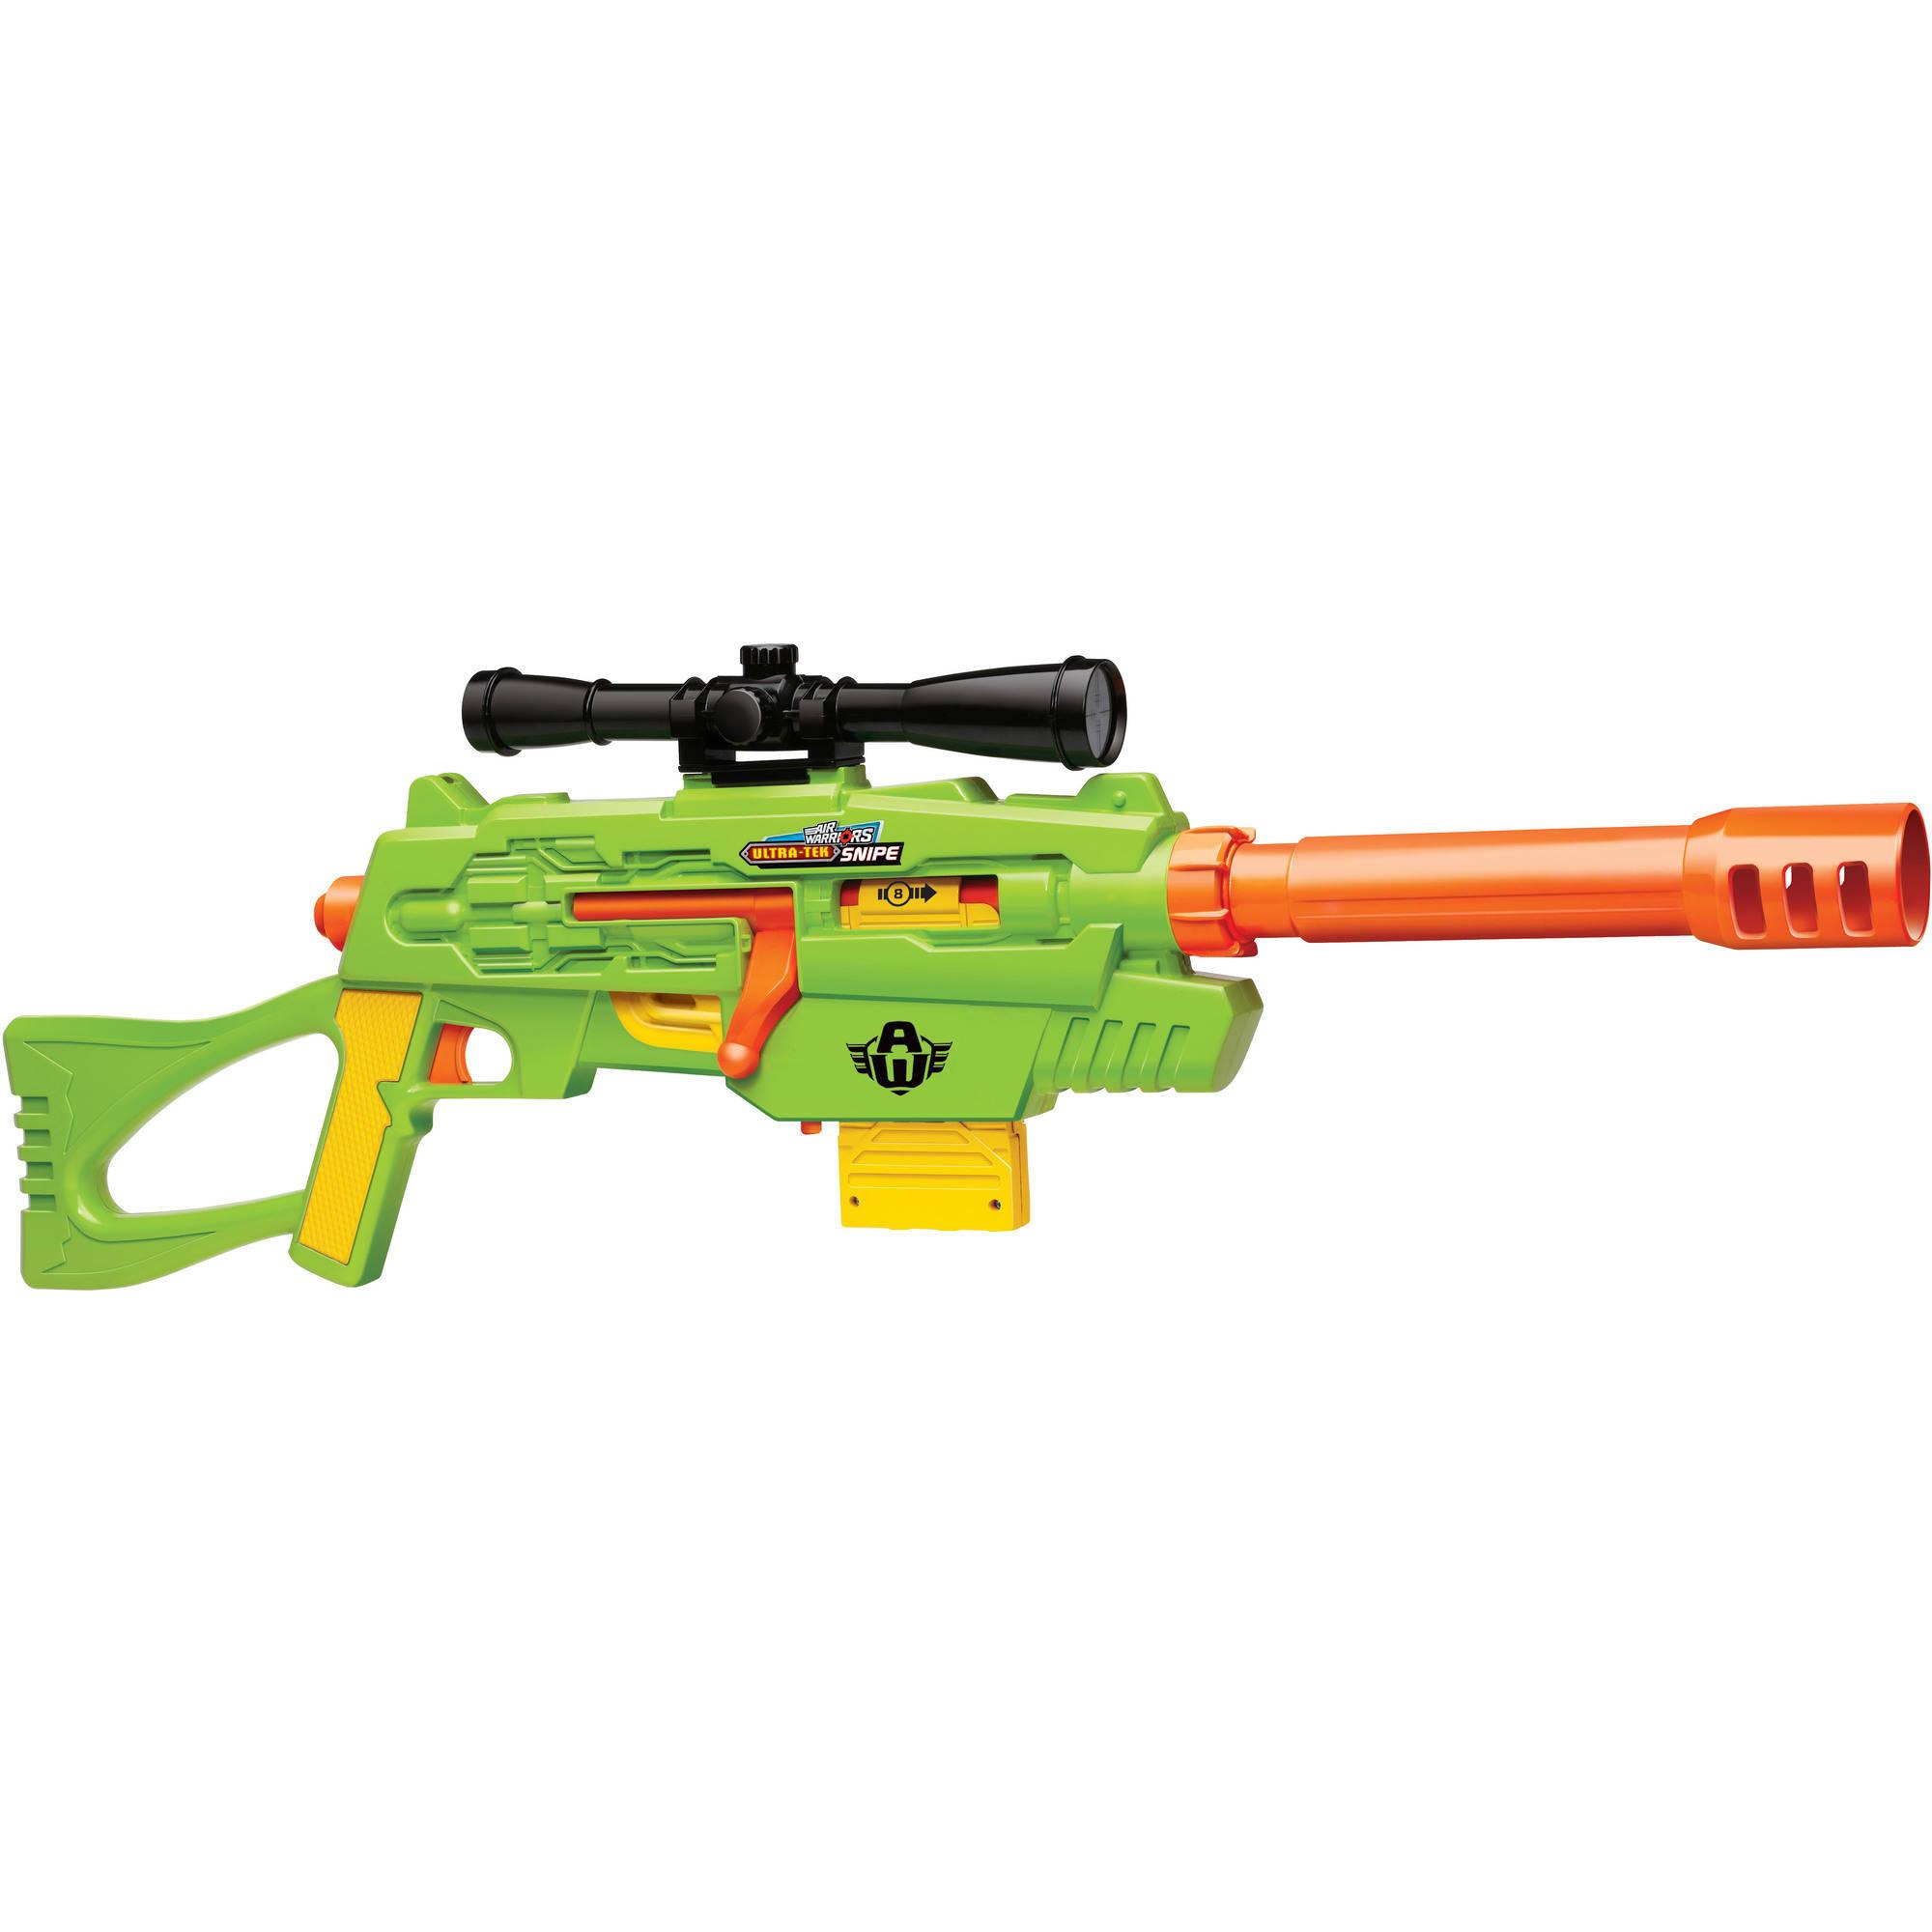 Buzz Bee Toys Air Warriors Ultra - tek Snipe